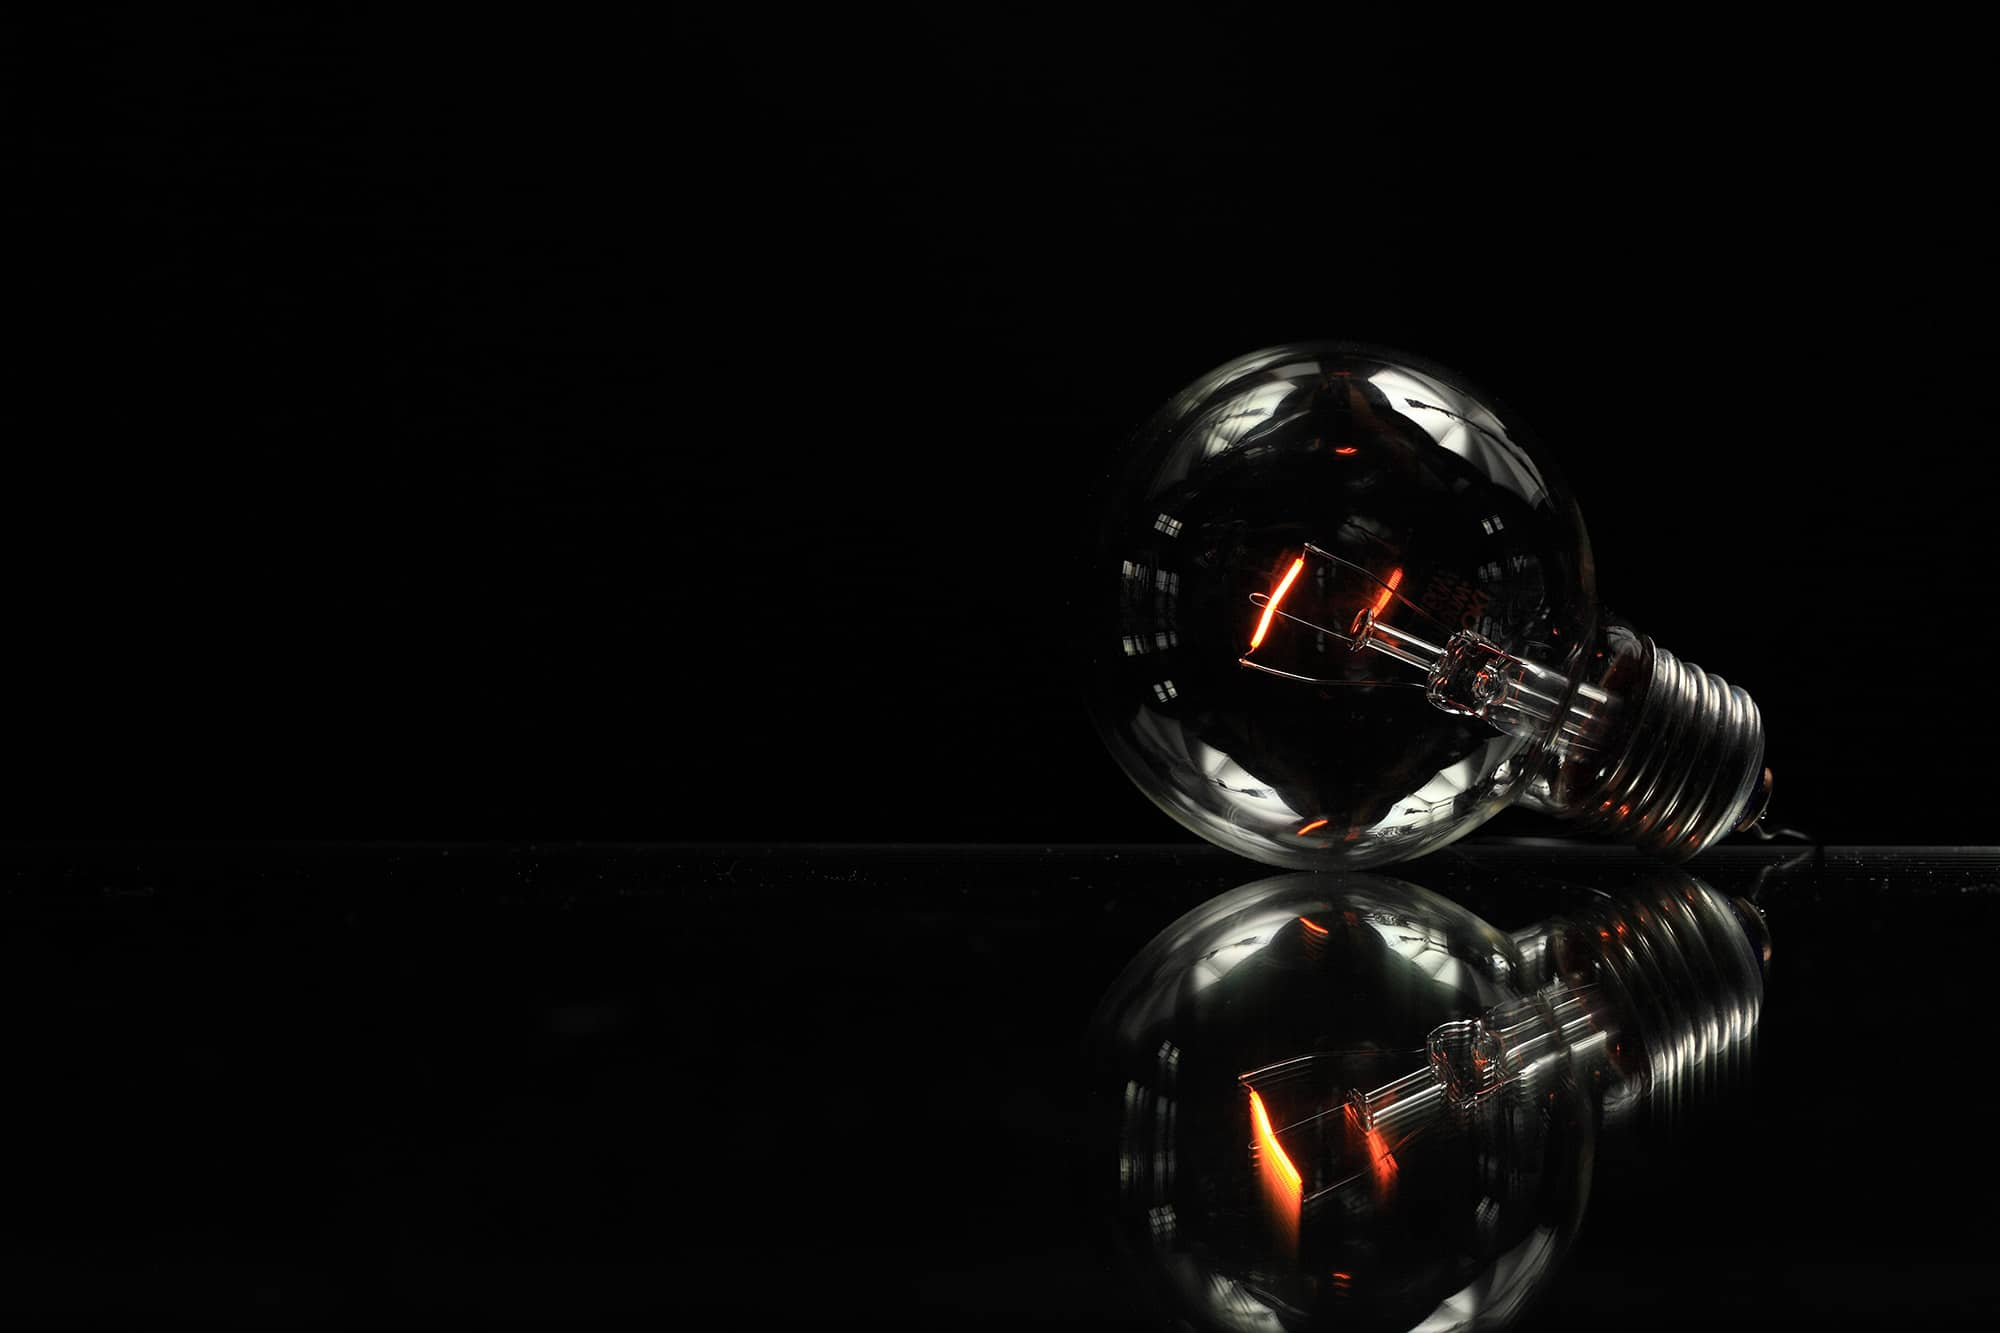 lightbulb in dark room